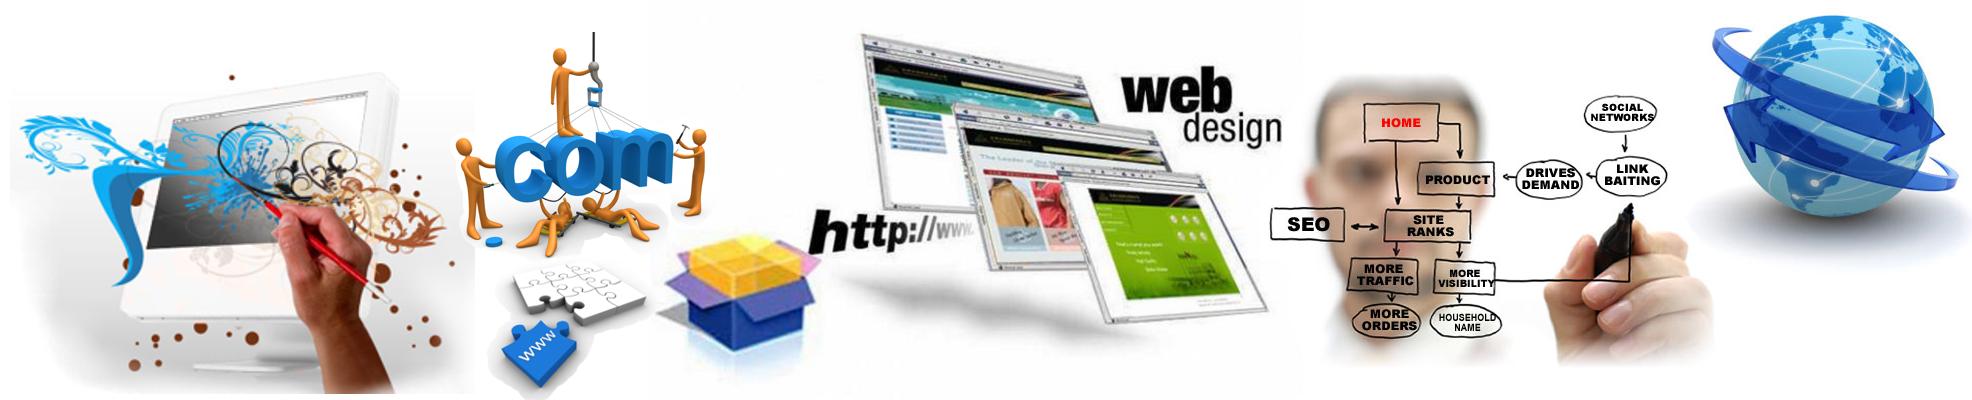 Web Design PNG - 5869